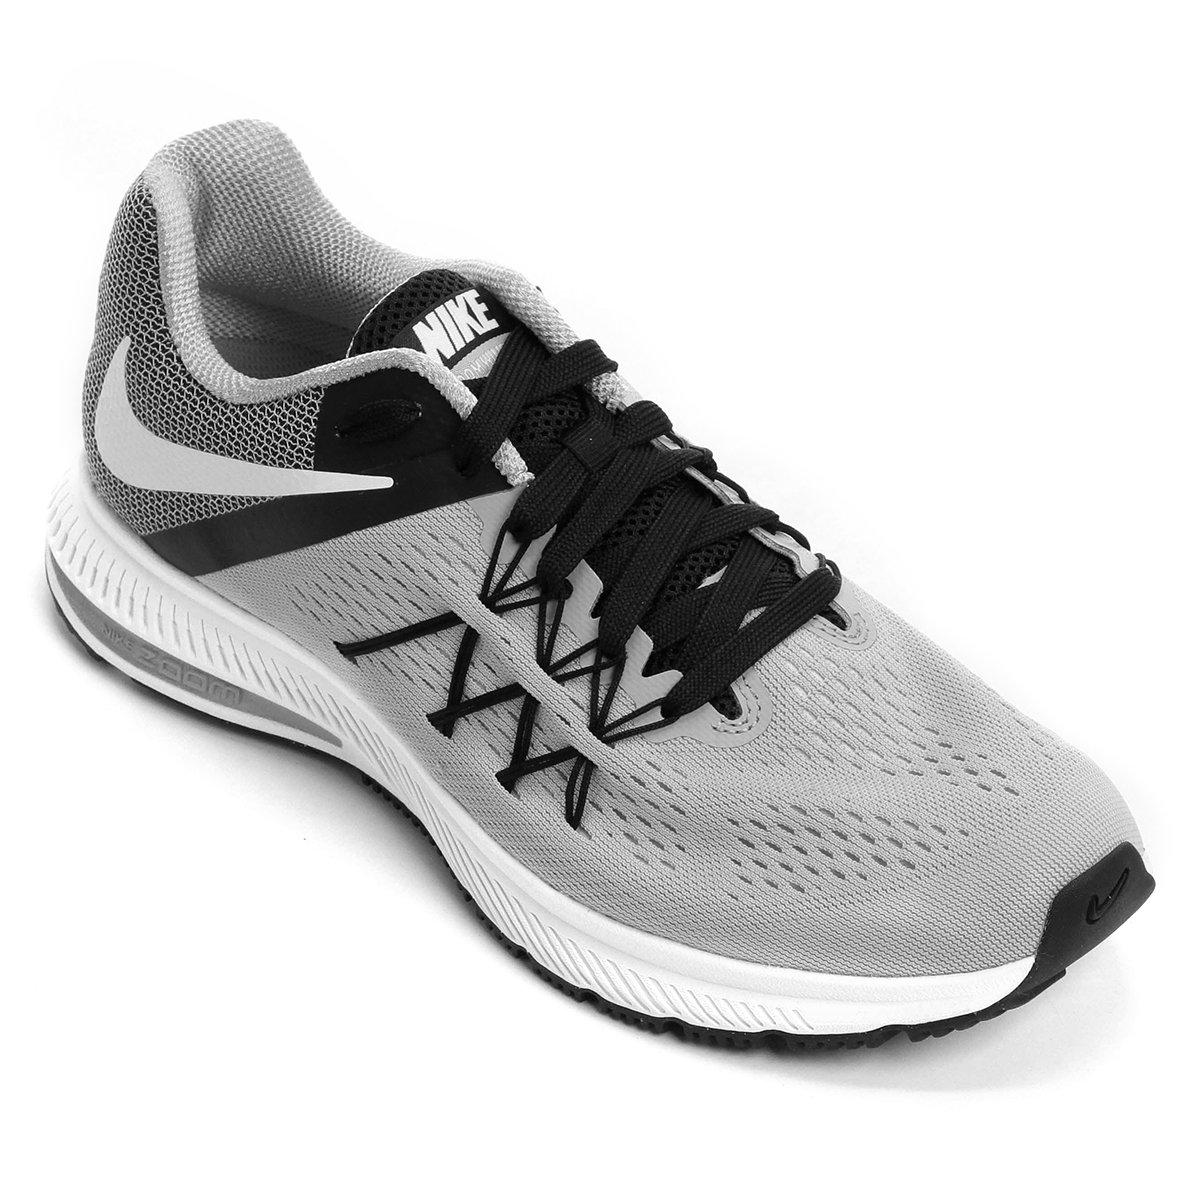 8c8d3a912 Tênis Nike Zoom Winflo 3 Masculino - Compre Agora